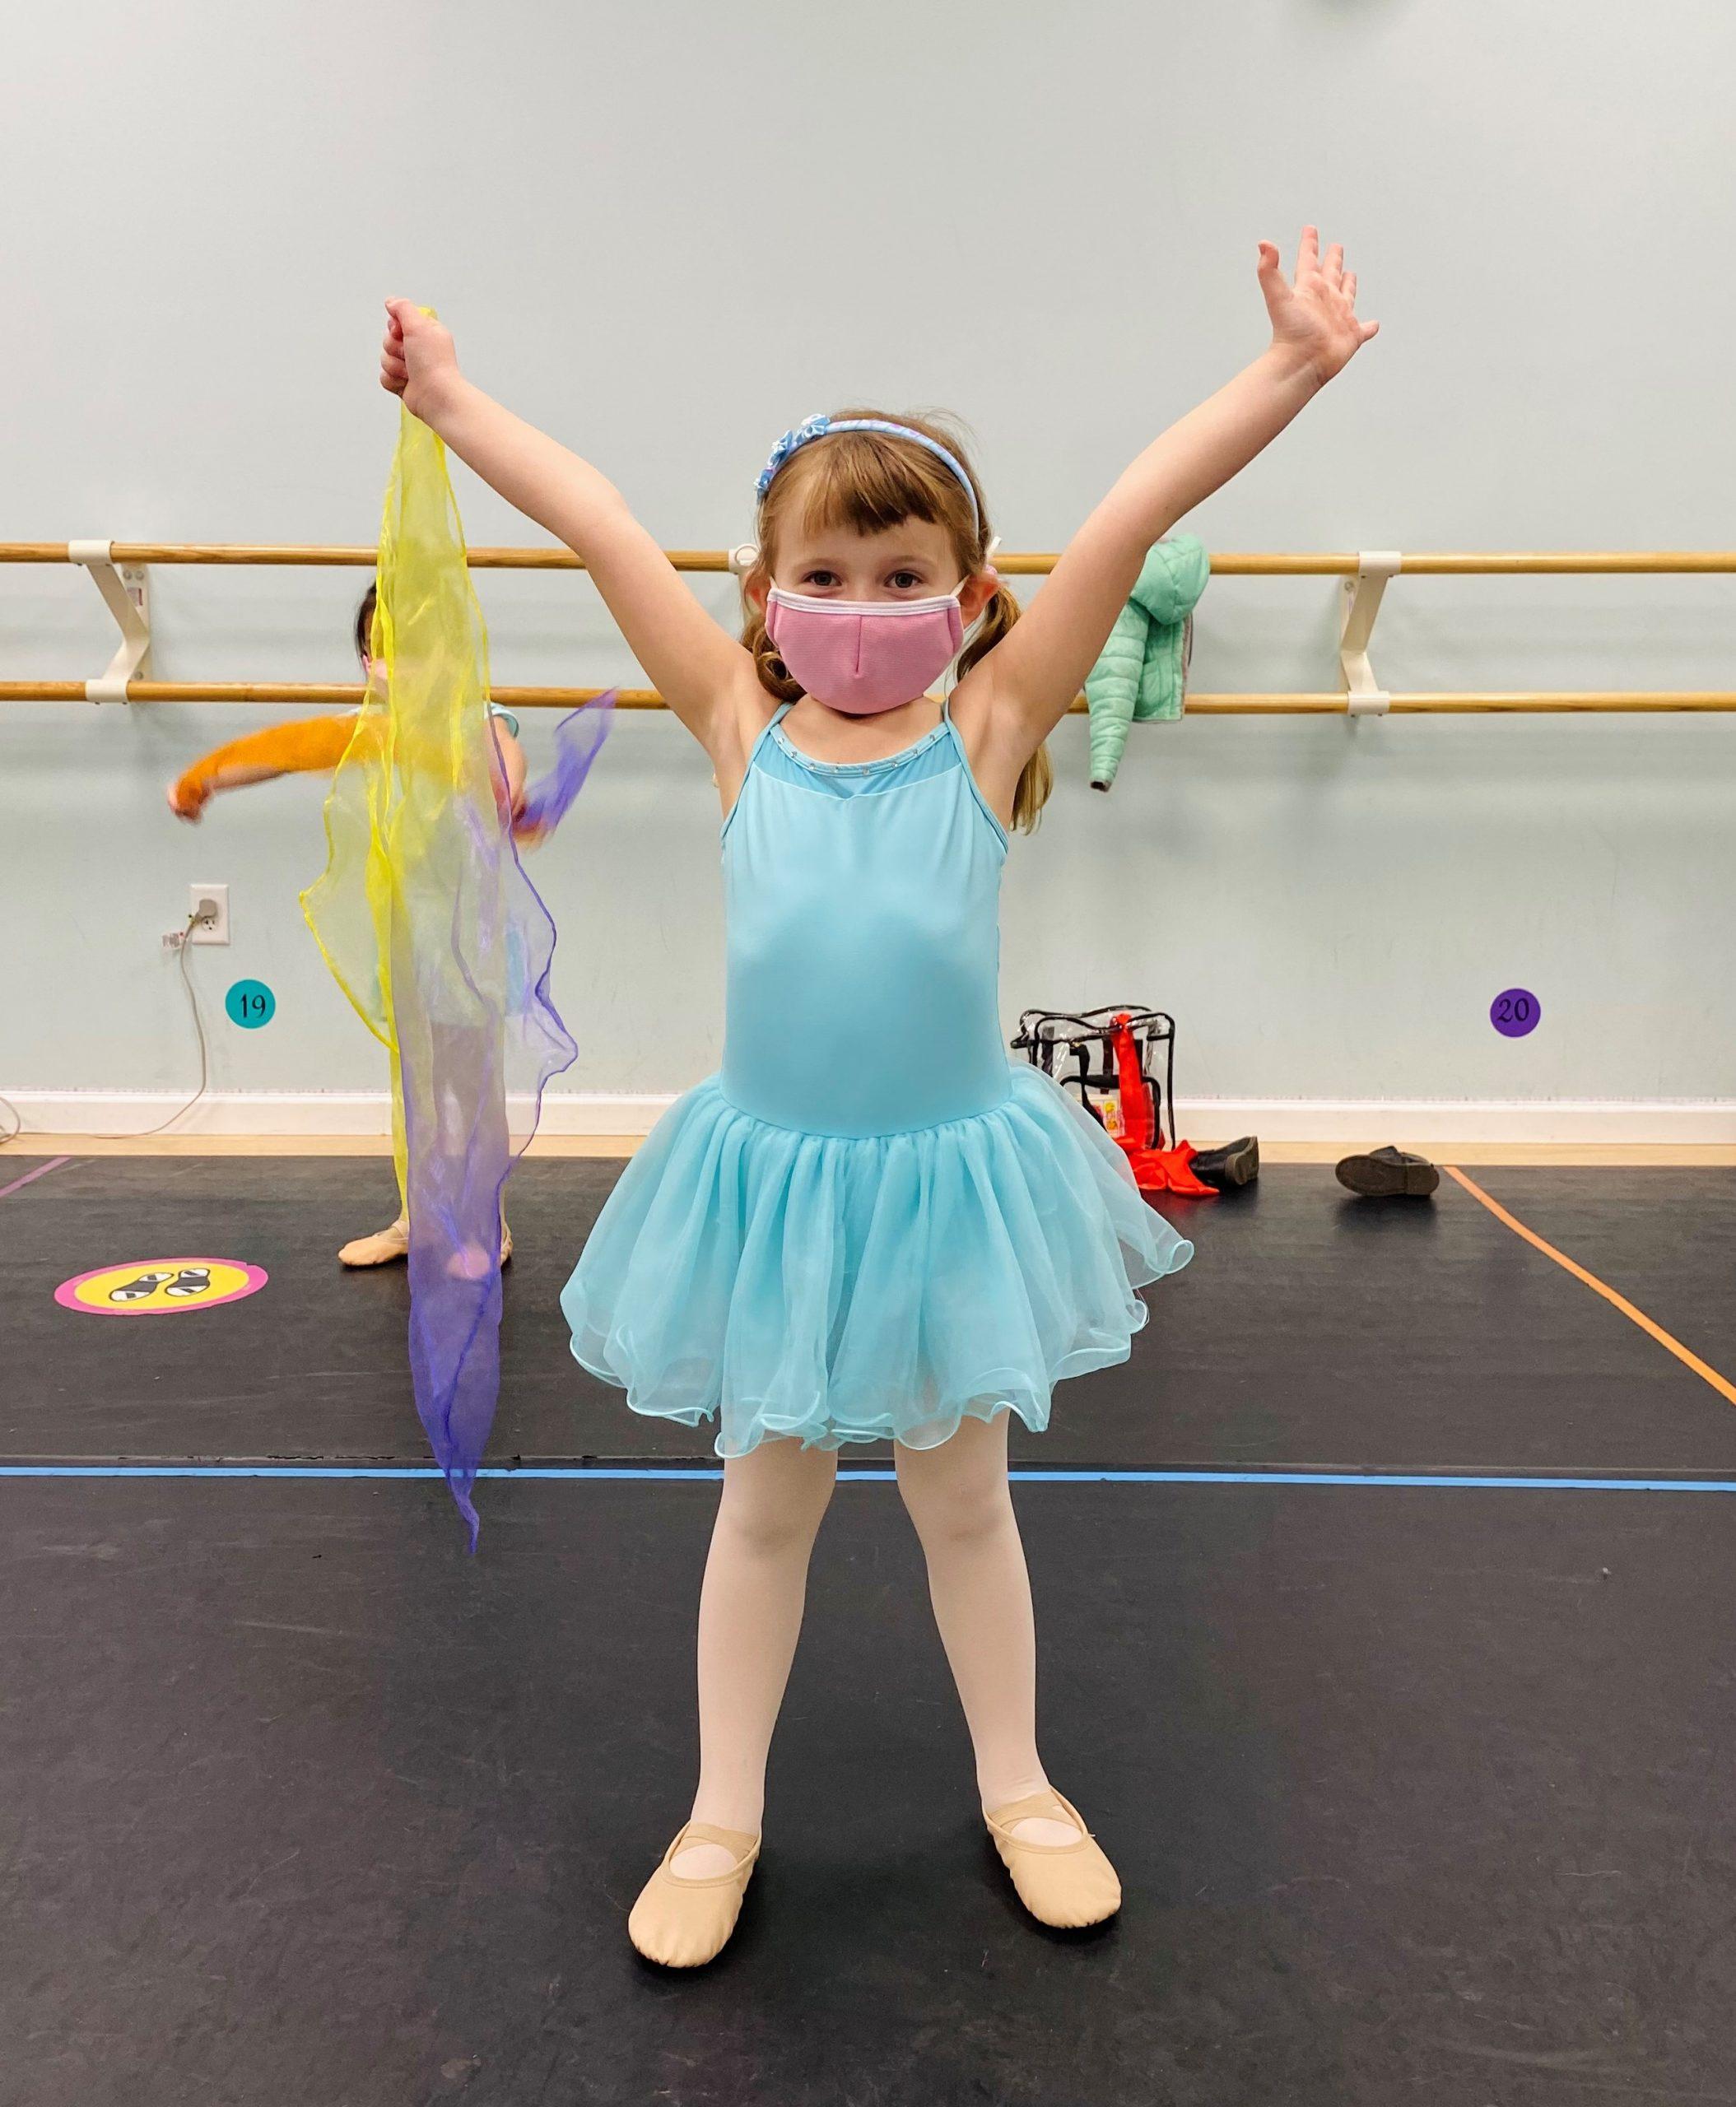 kids dance classes germantown kentlands maryland md boyds clarksburg ballet tap classes children preschool lessons